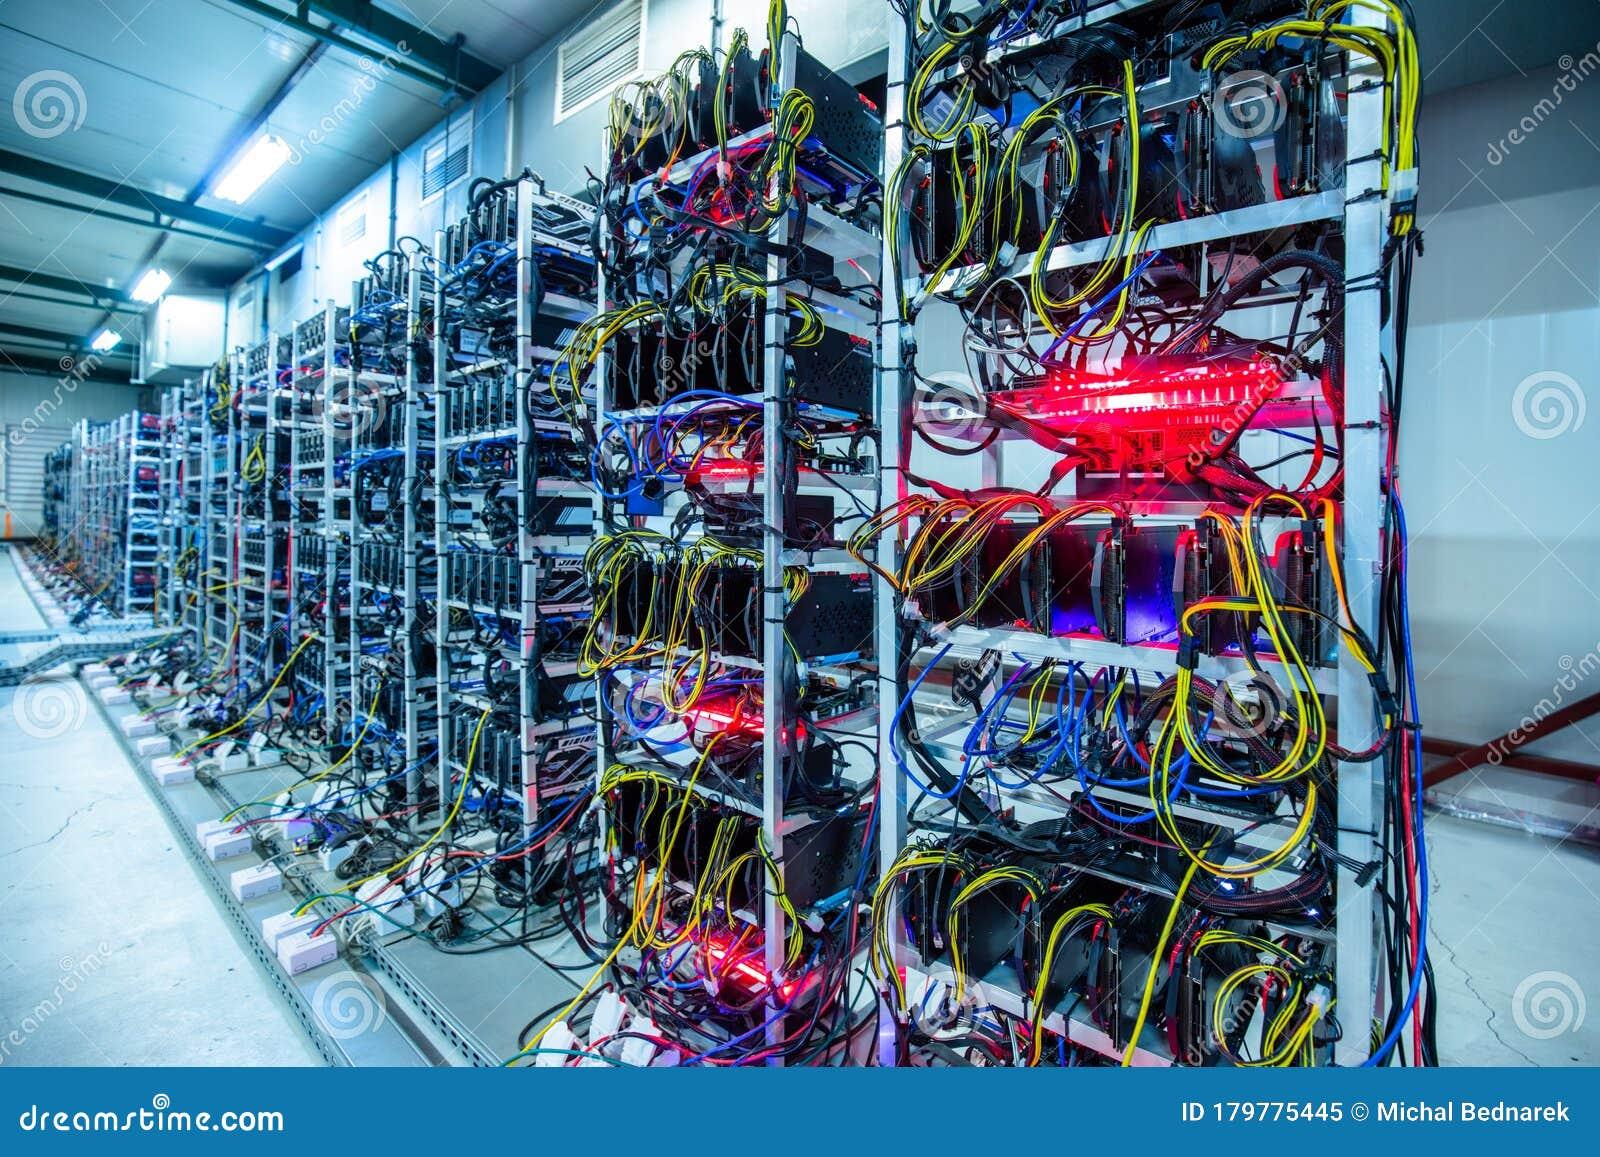 kereskedelmi bitcoins az usa-ban